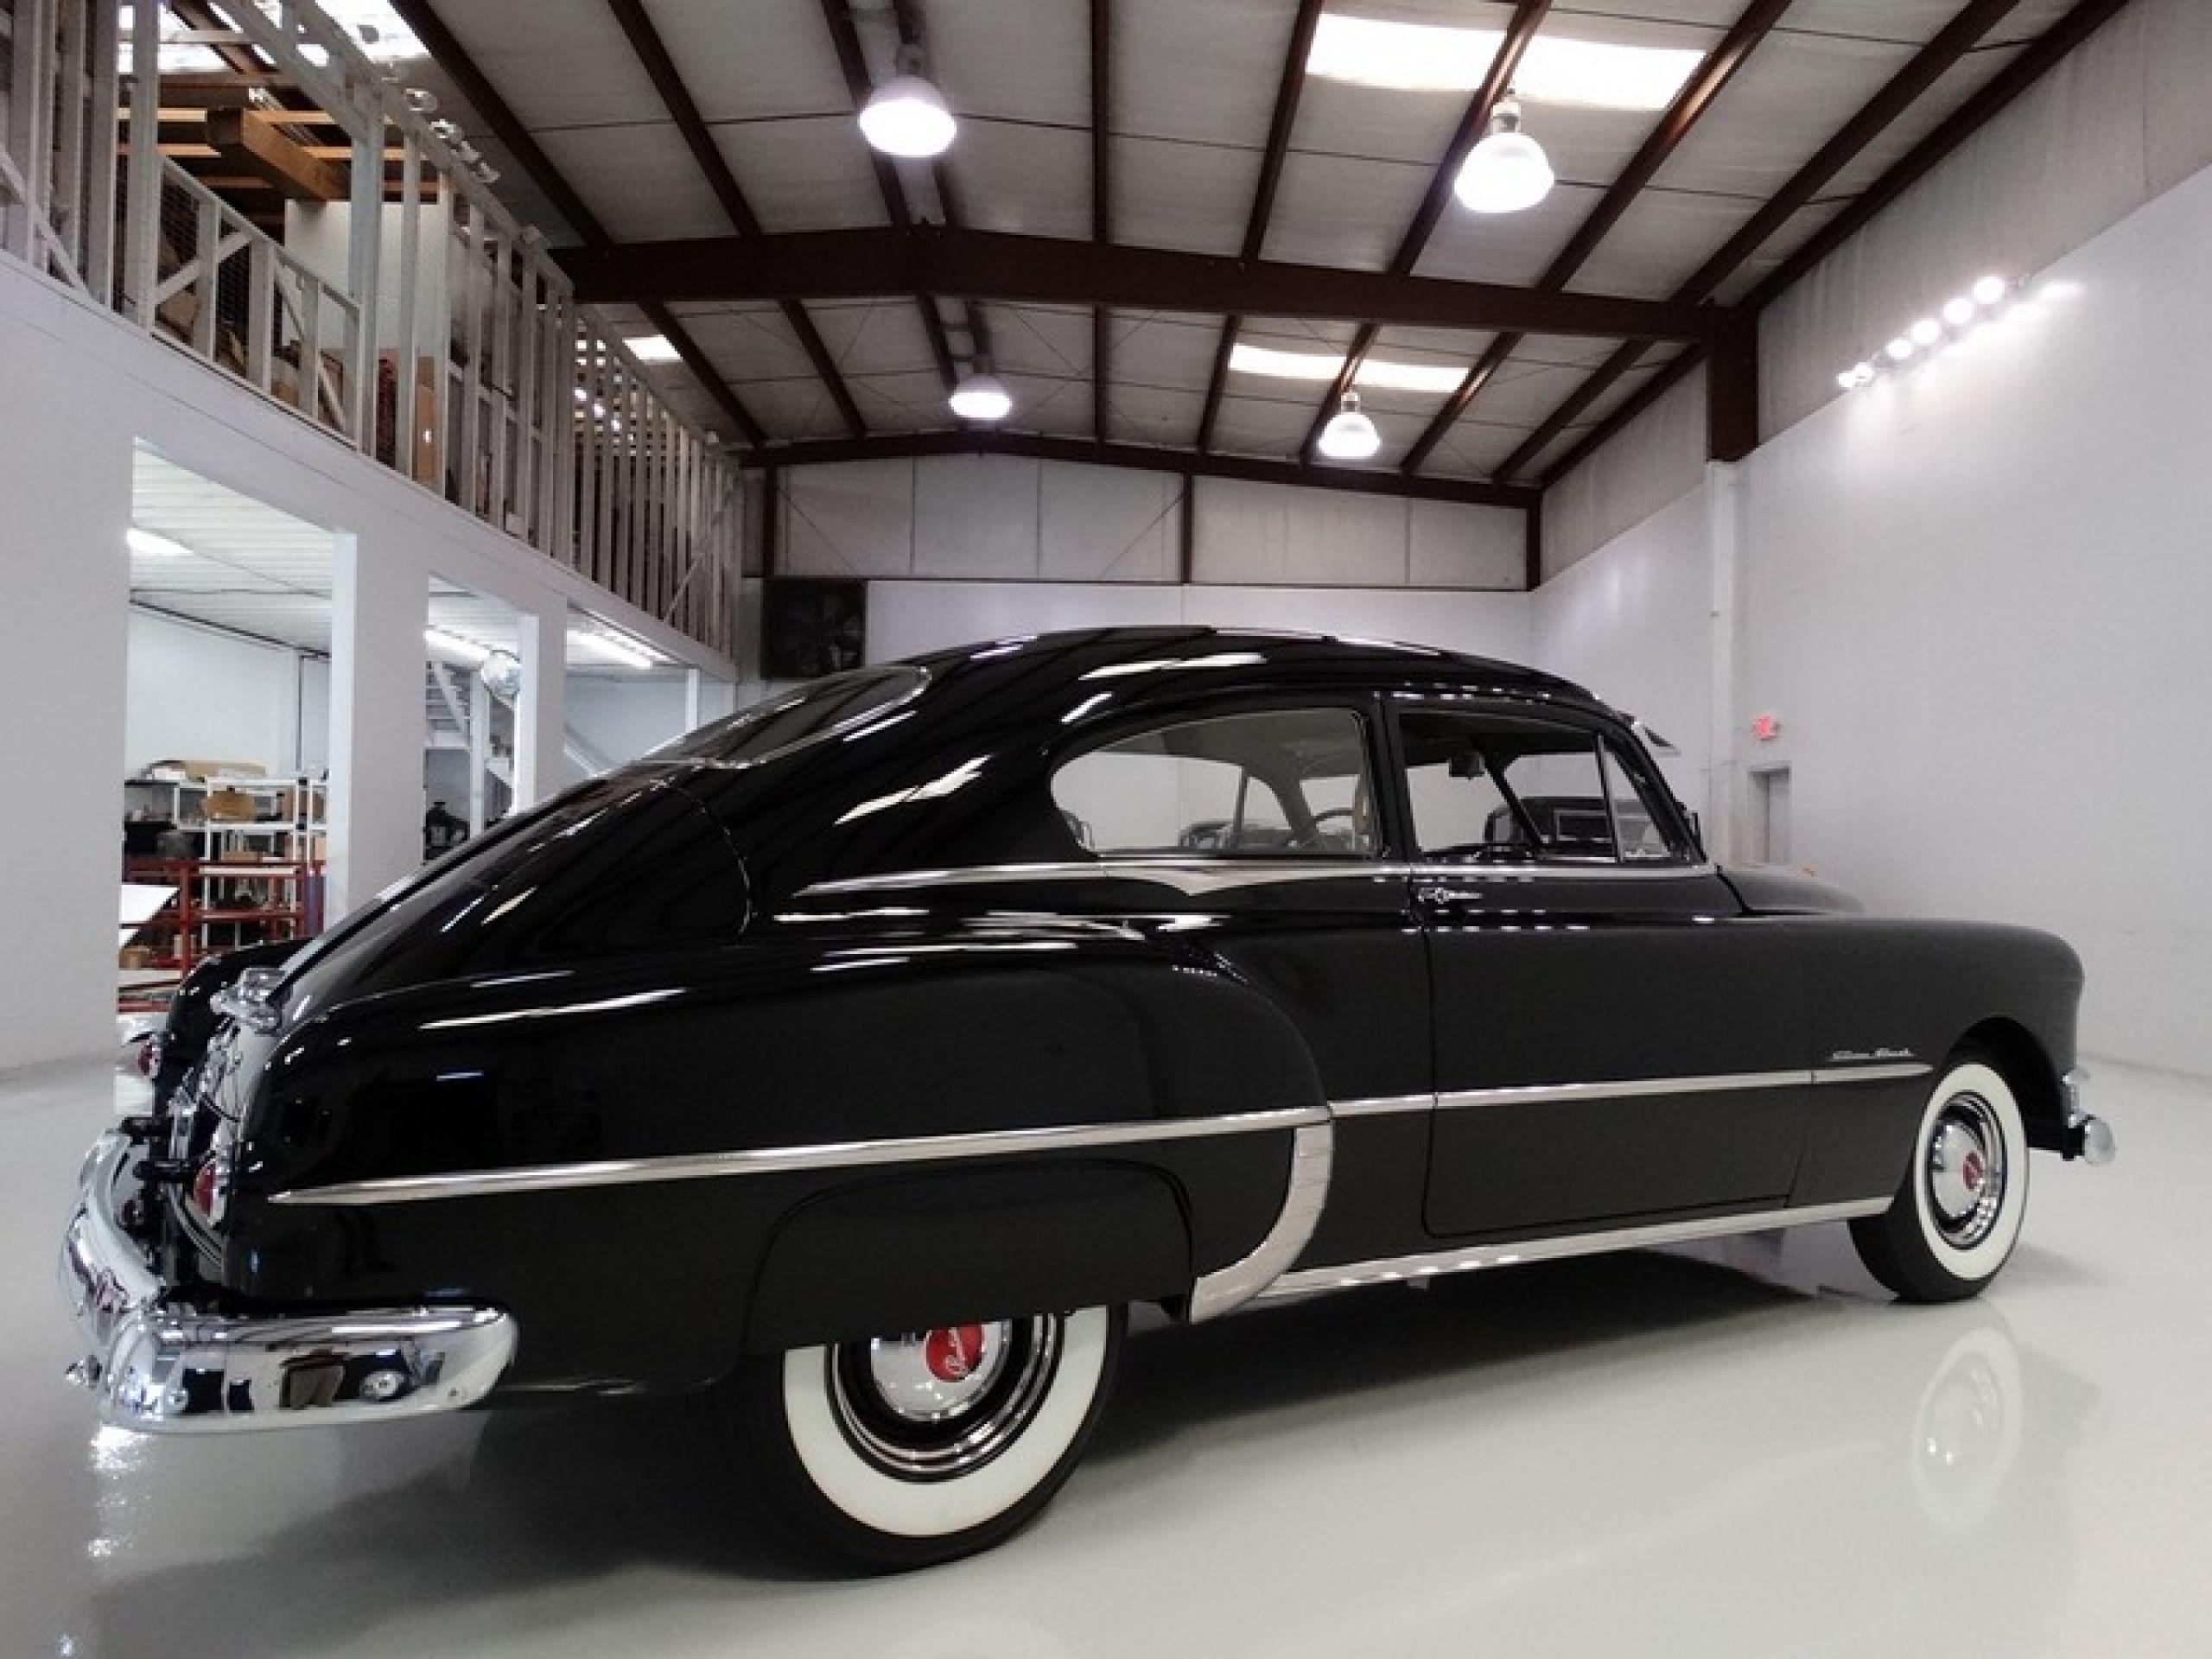 1950 Pontiac Streamliner Silver Streak Deluxe Coupe